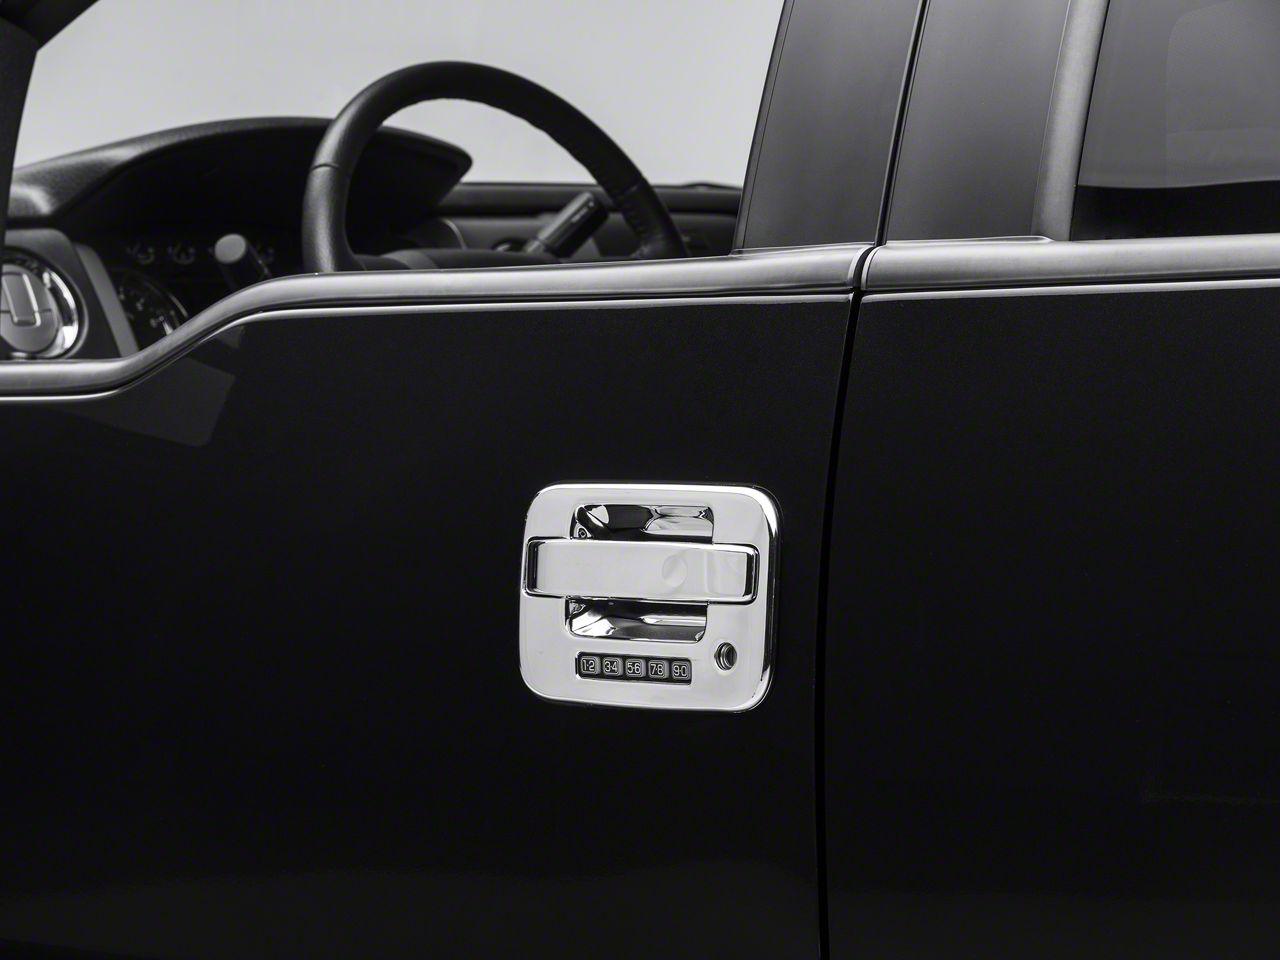 SpeedForm Chrome Door Handle Covers - 4-Door (04-14 F-150 w/Key Pad, w/o Passenger Key Hole)